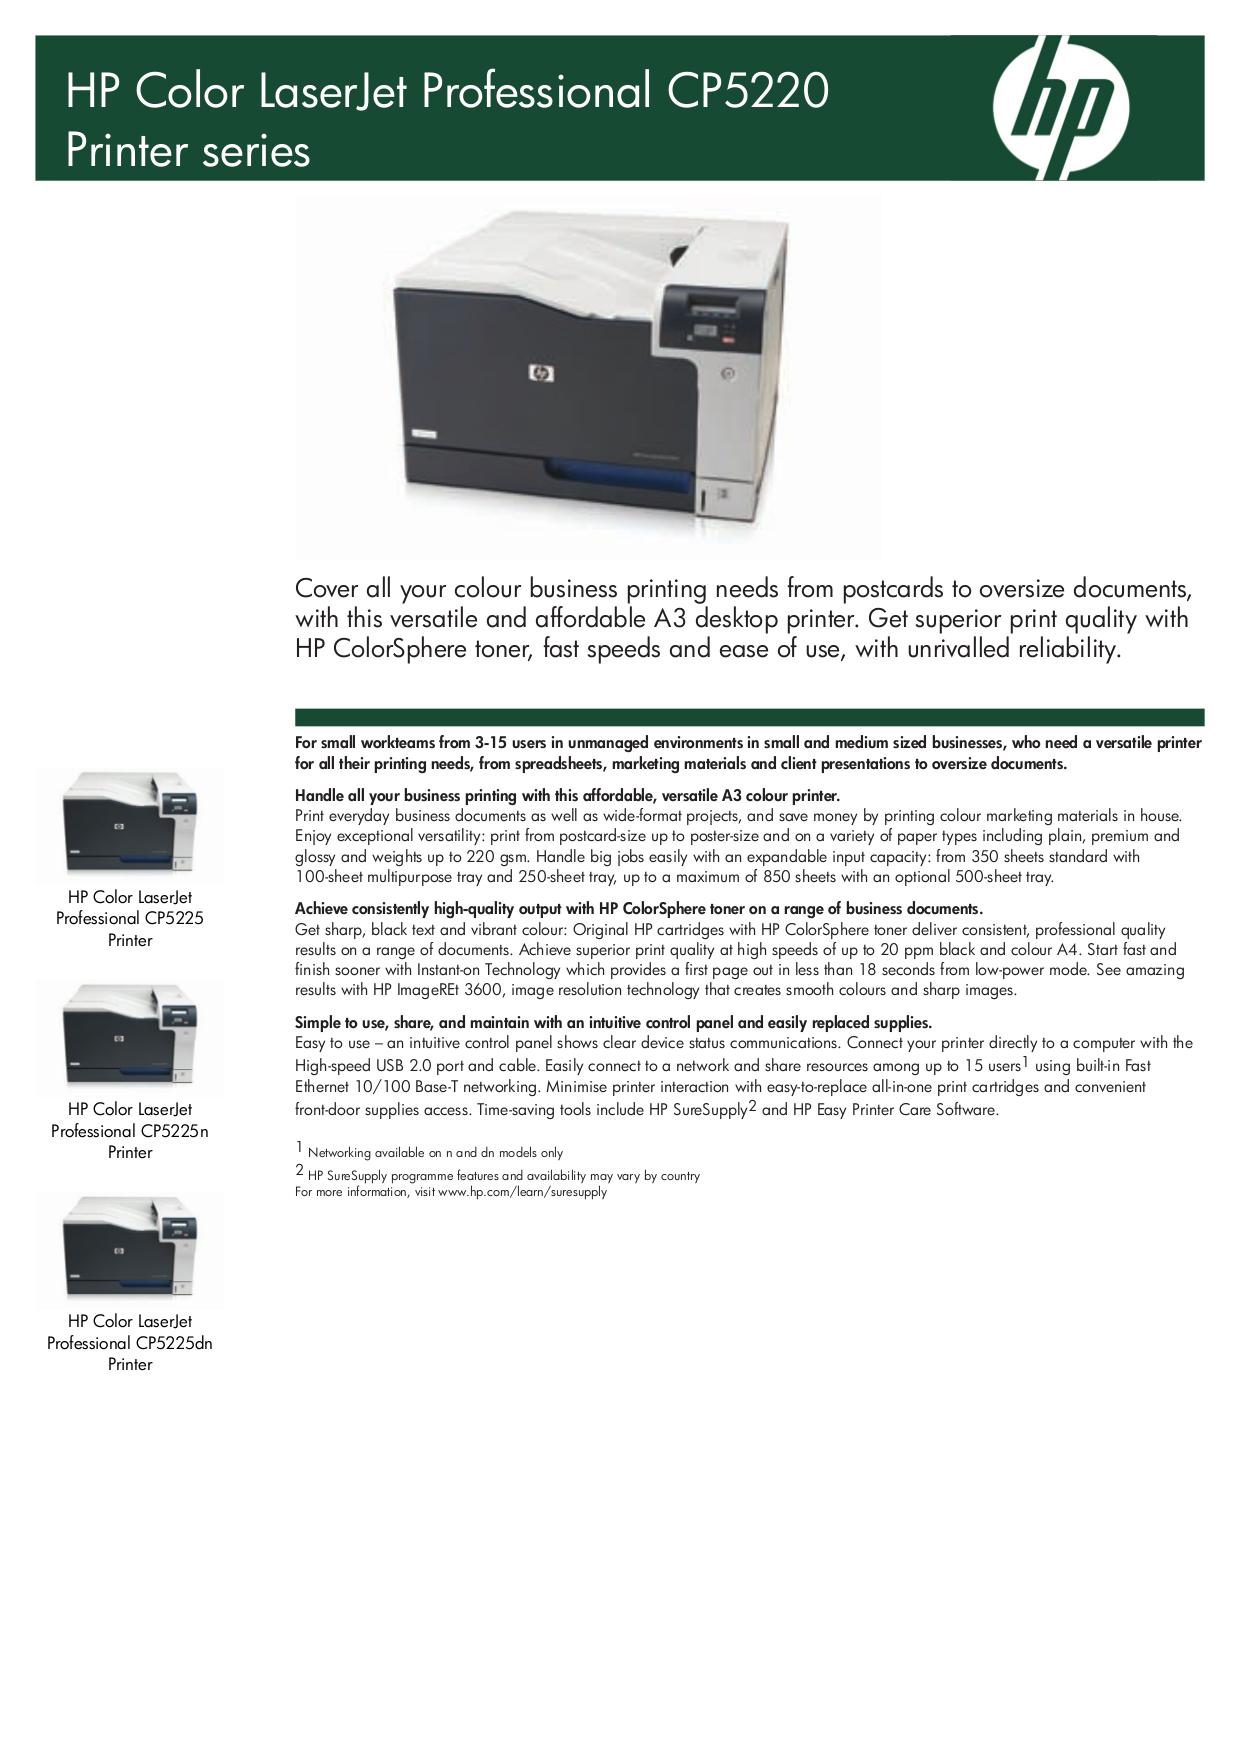 Hp color laserjet professional cp5225n printer a3 ce711a office - Pdf For Hp Printer Laserjet Color Laserjet Pro Cp5225n Manual